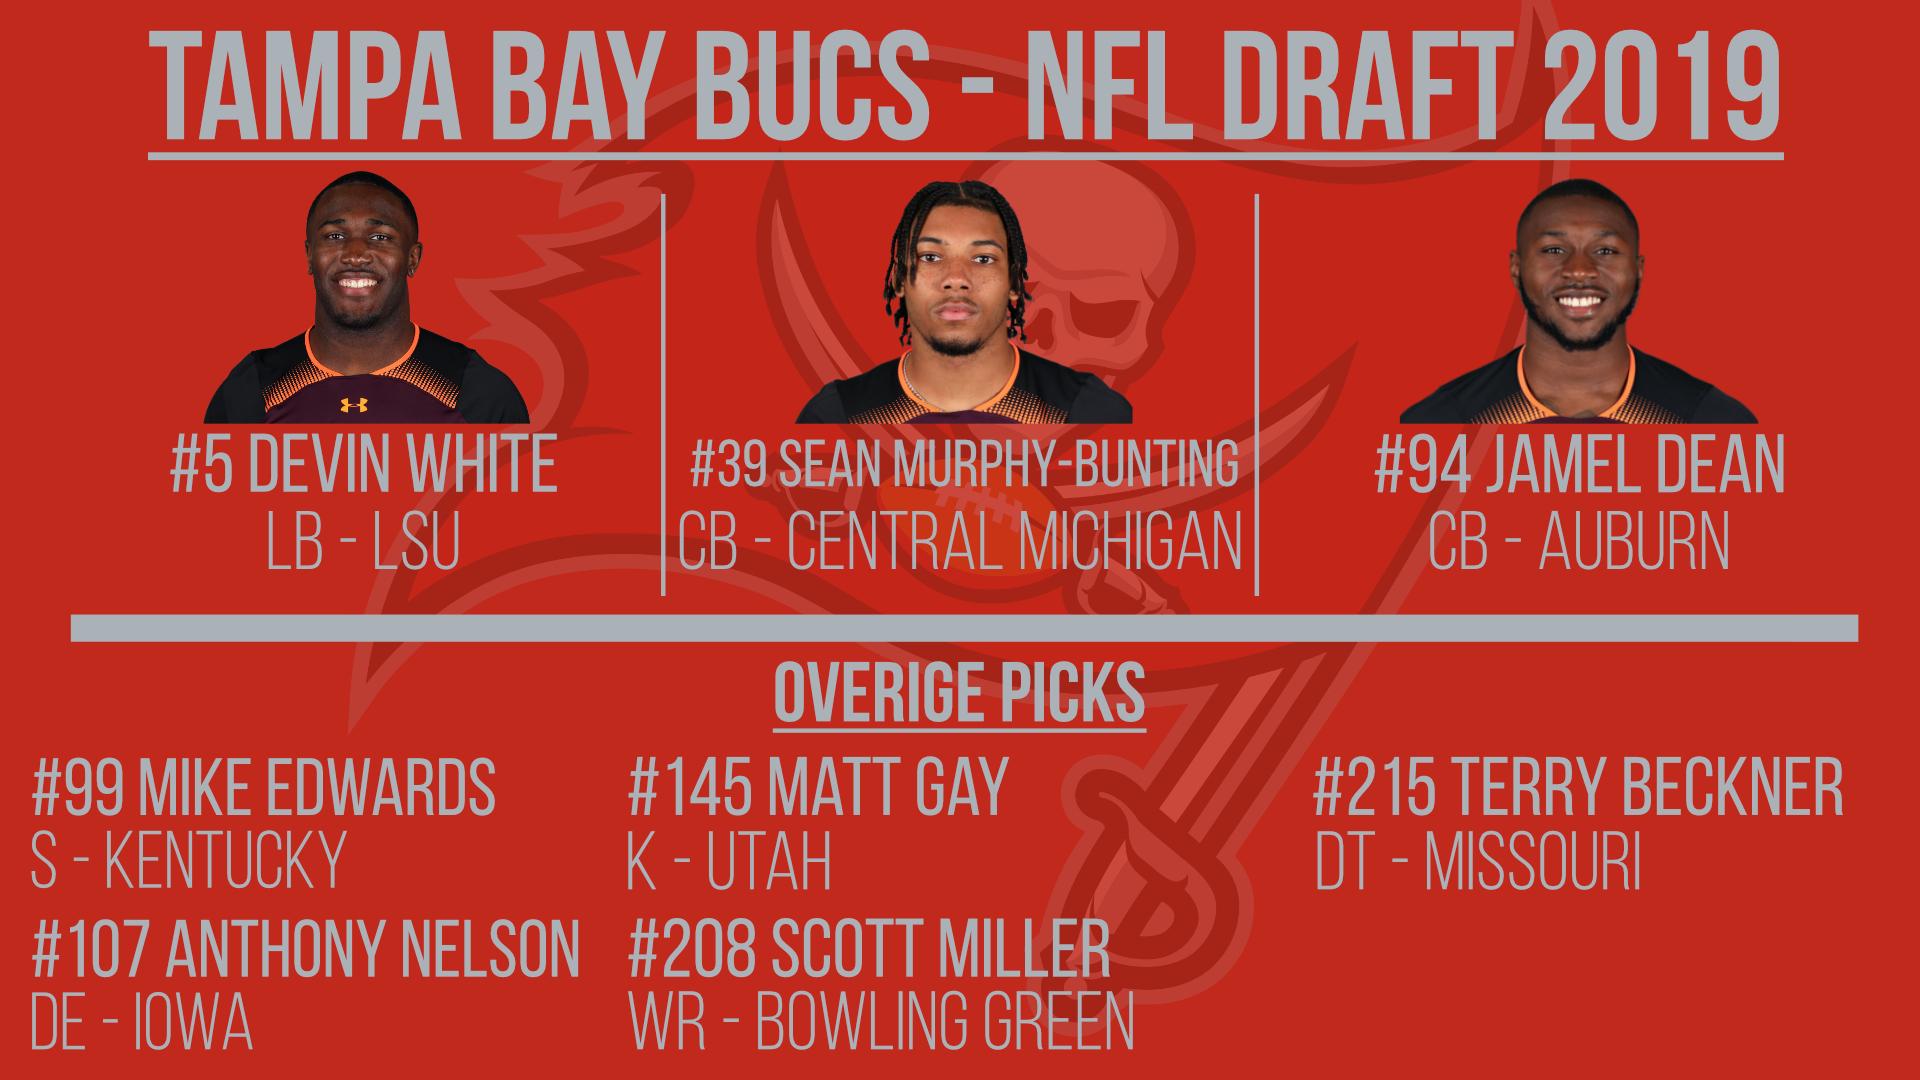 Tampa Bay Buccaneers: NFL Draft